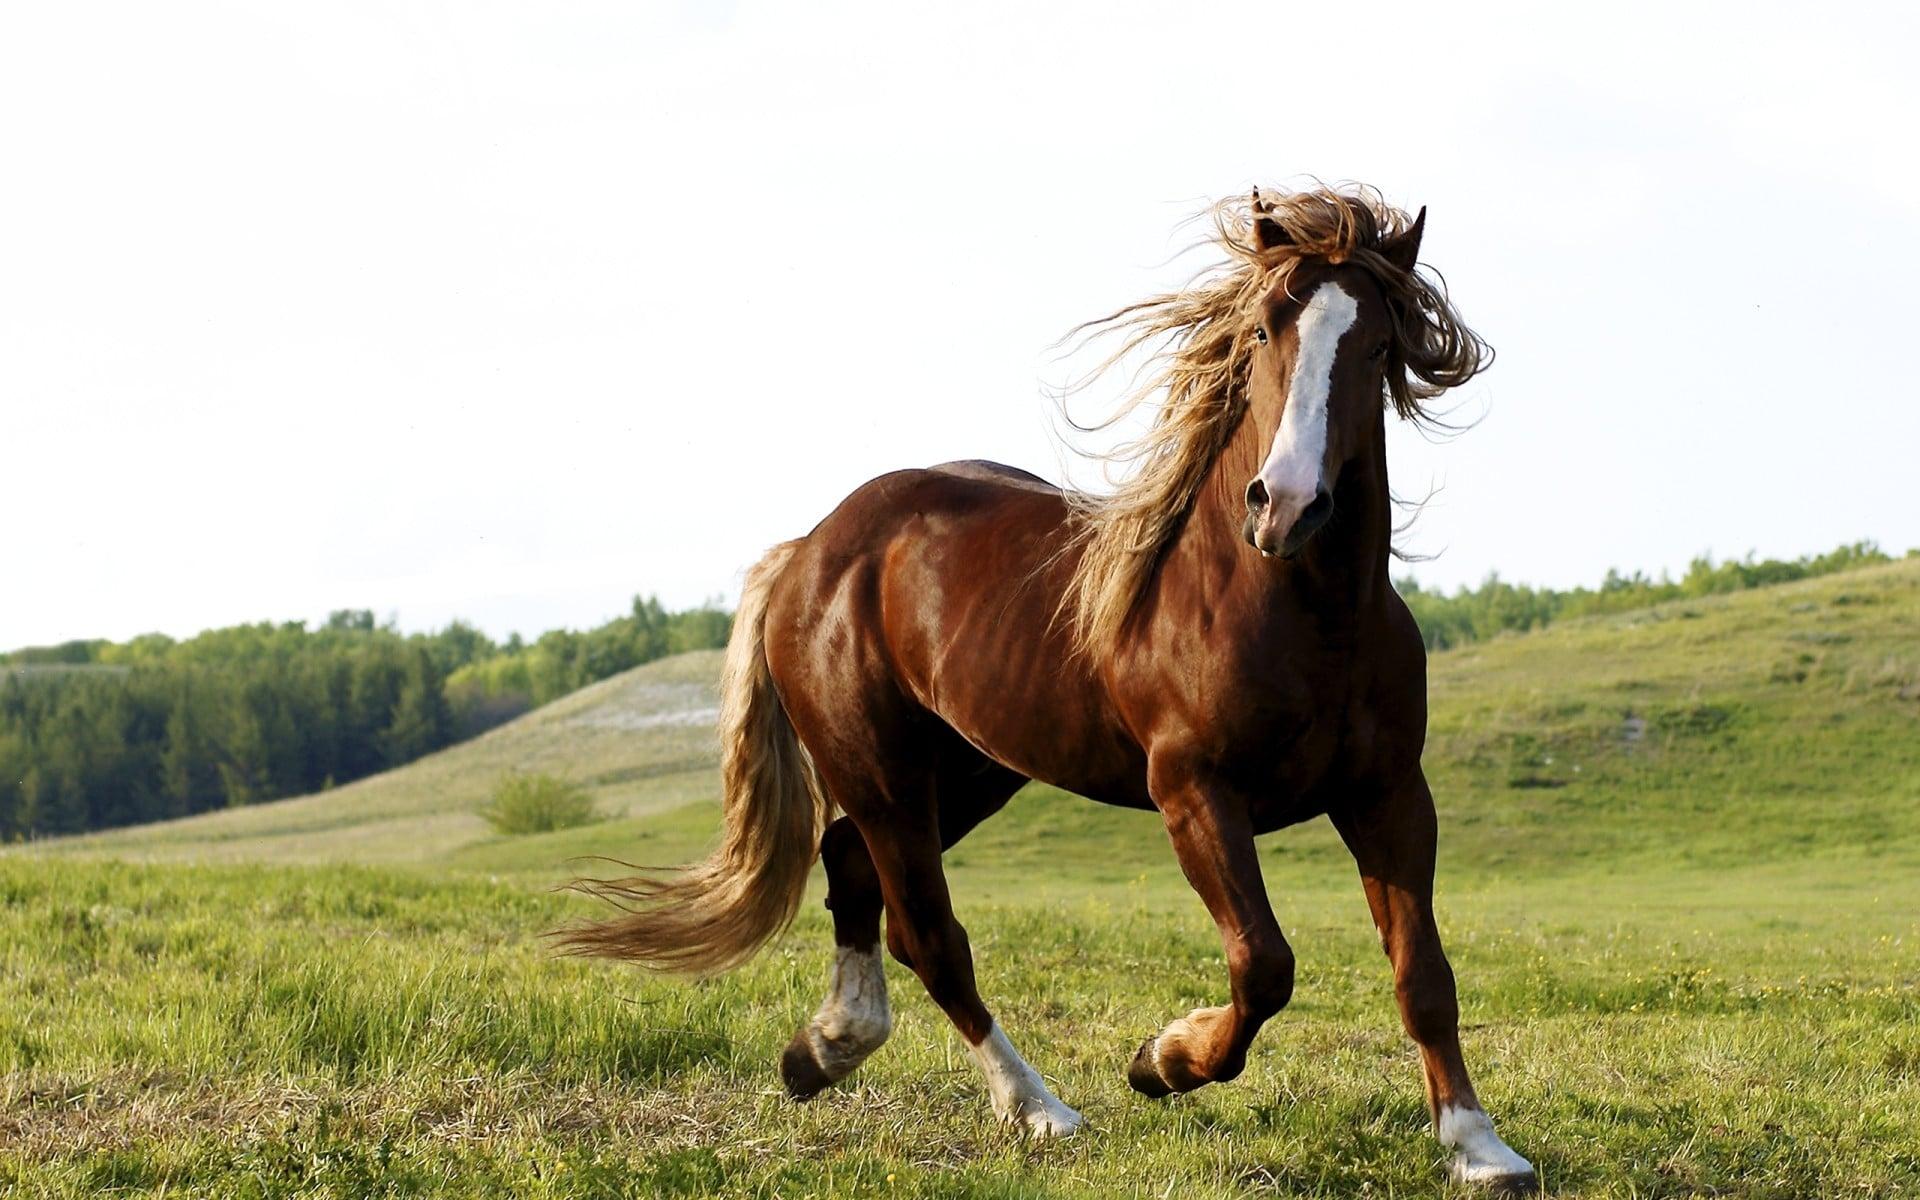 Runaway horse tracking